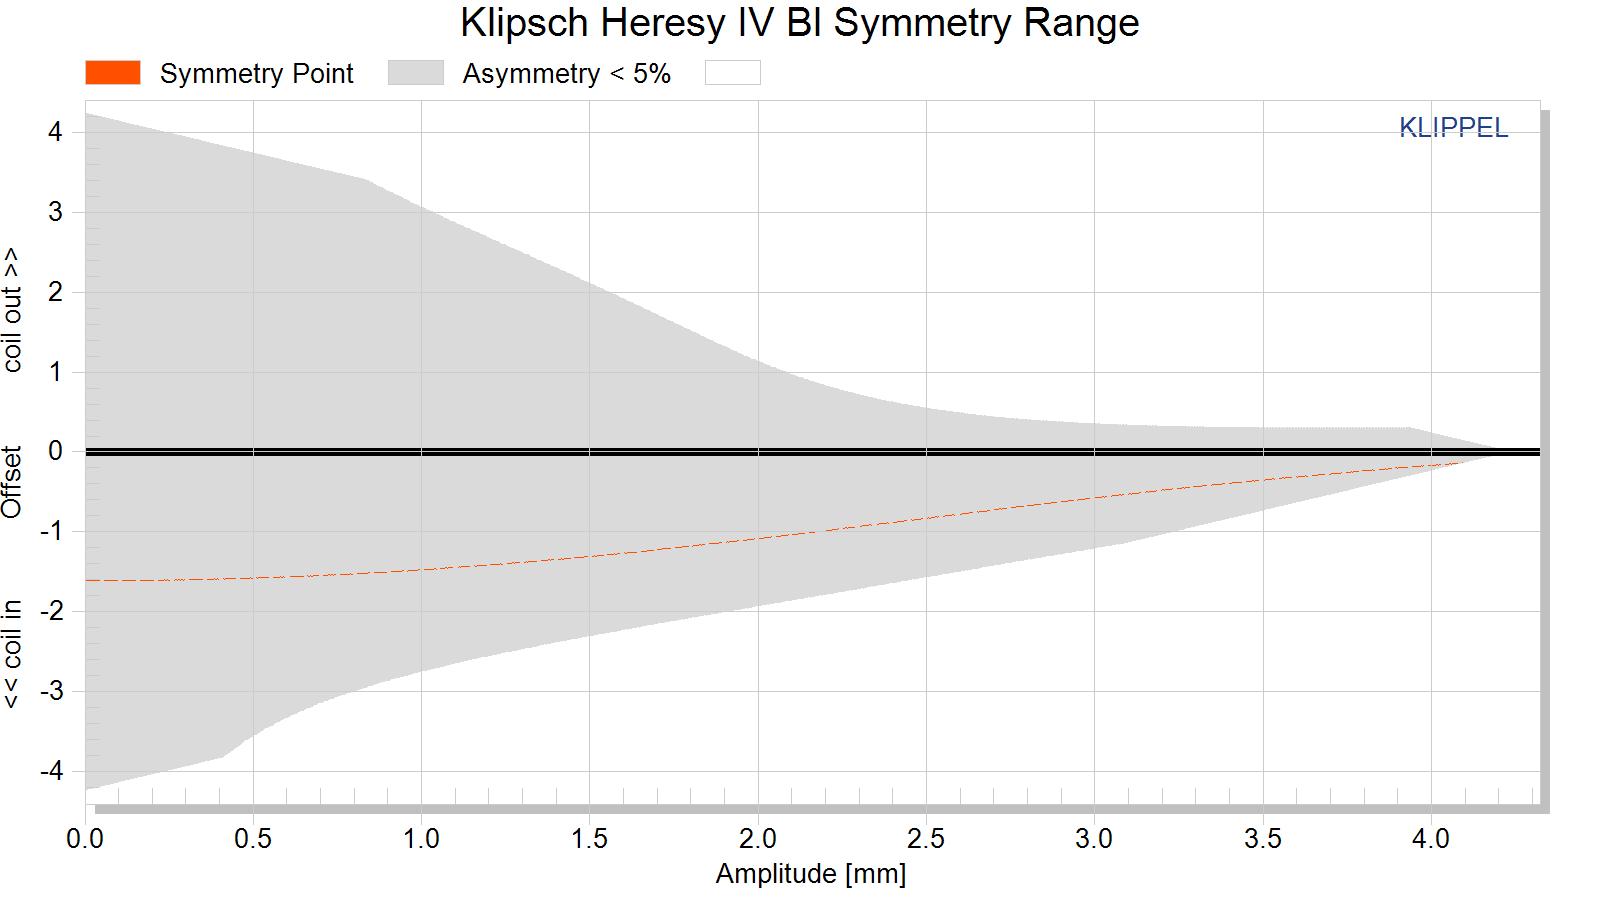 Klipsch Heresy IV Bl Symmetry Range.png